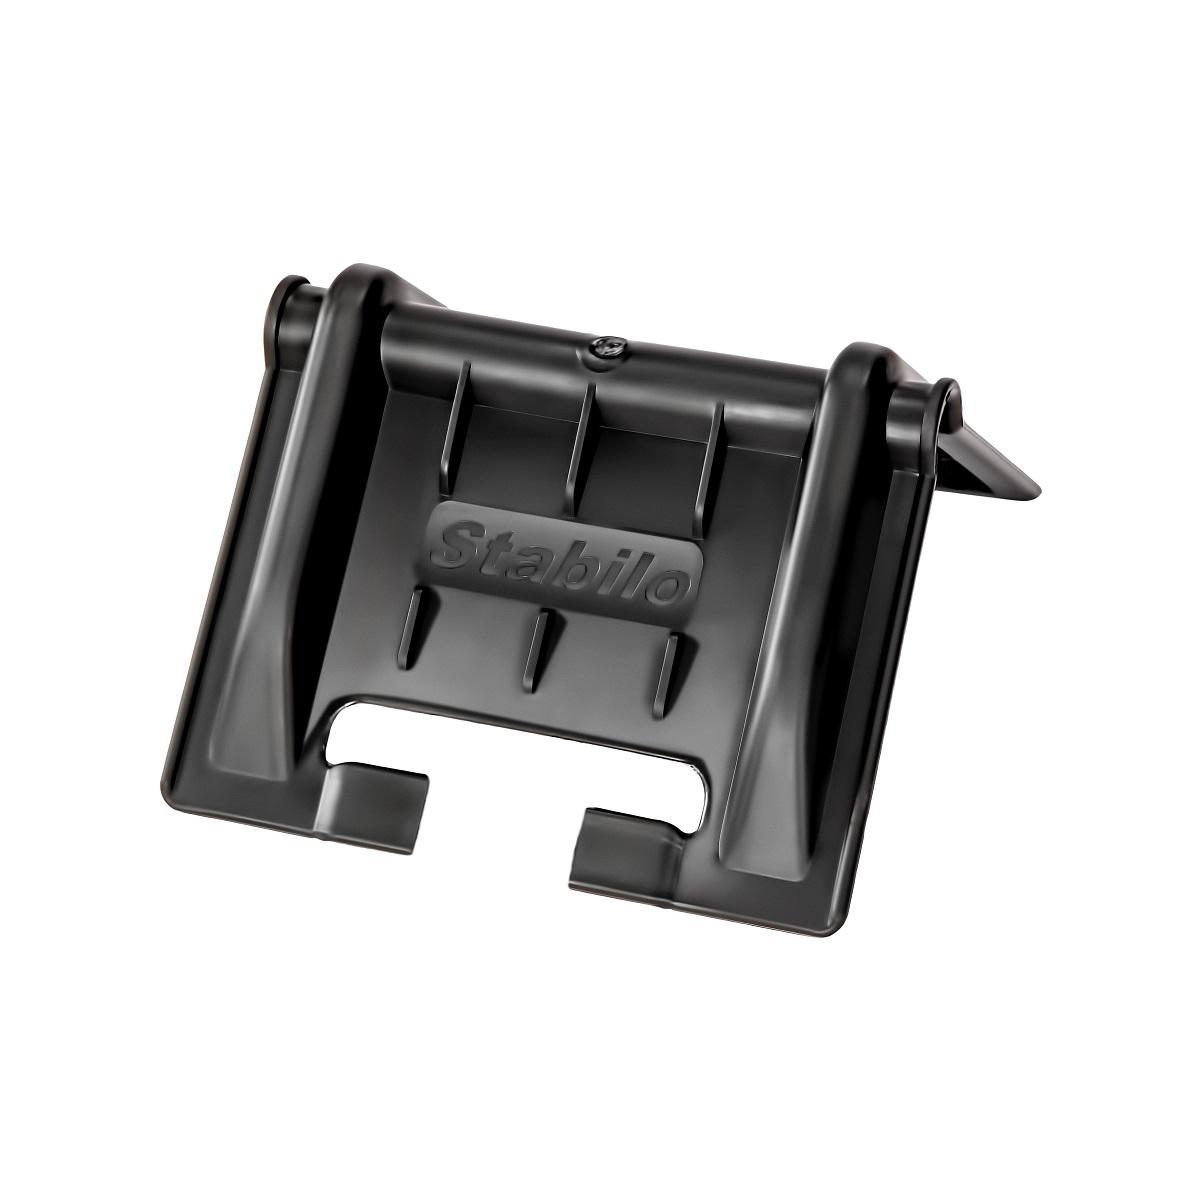 corner-mini-open-black